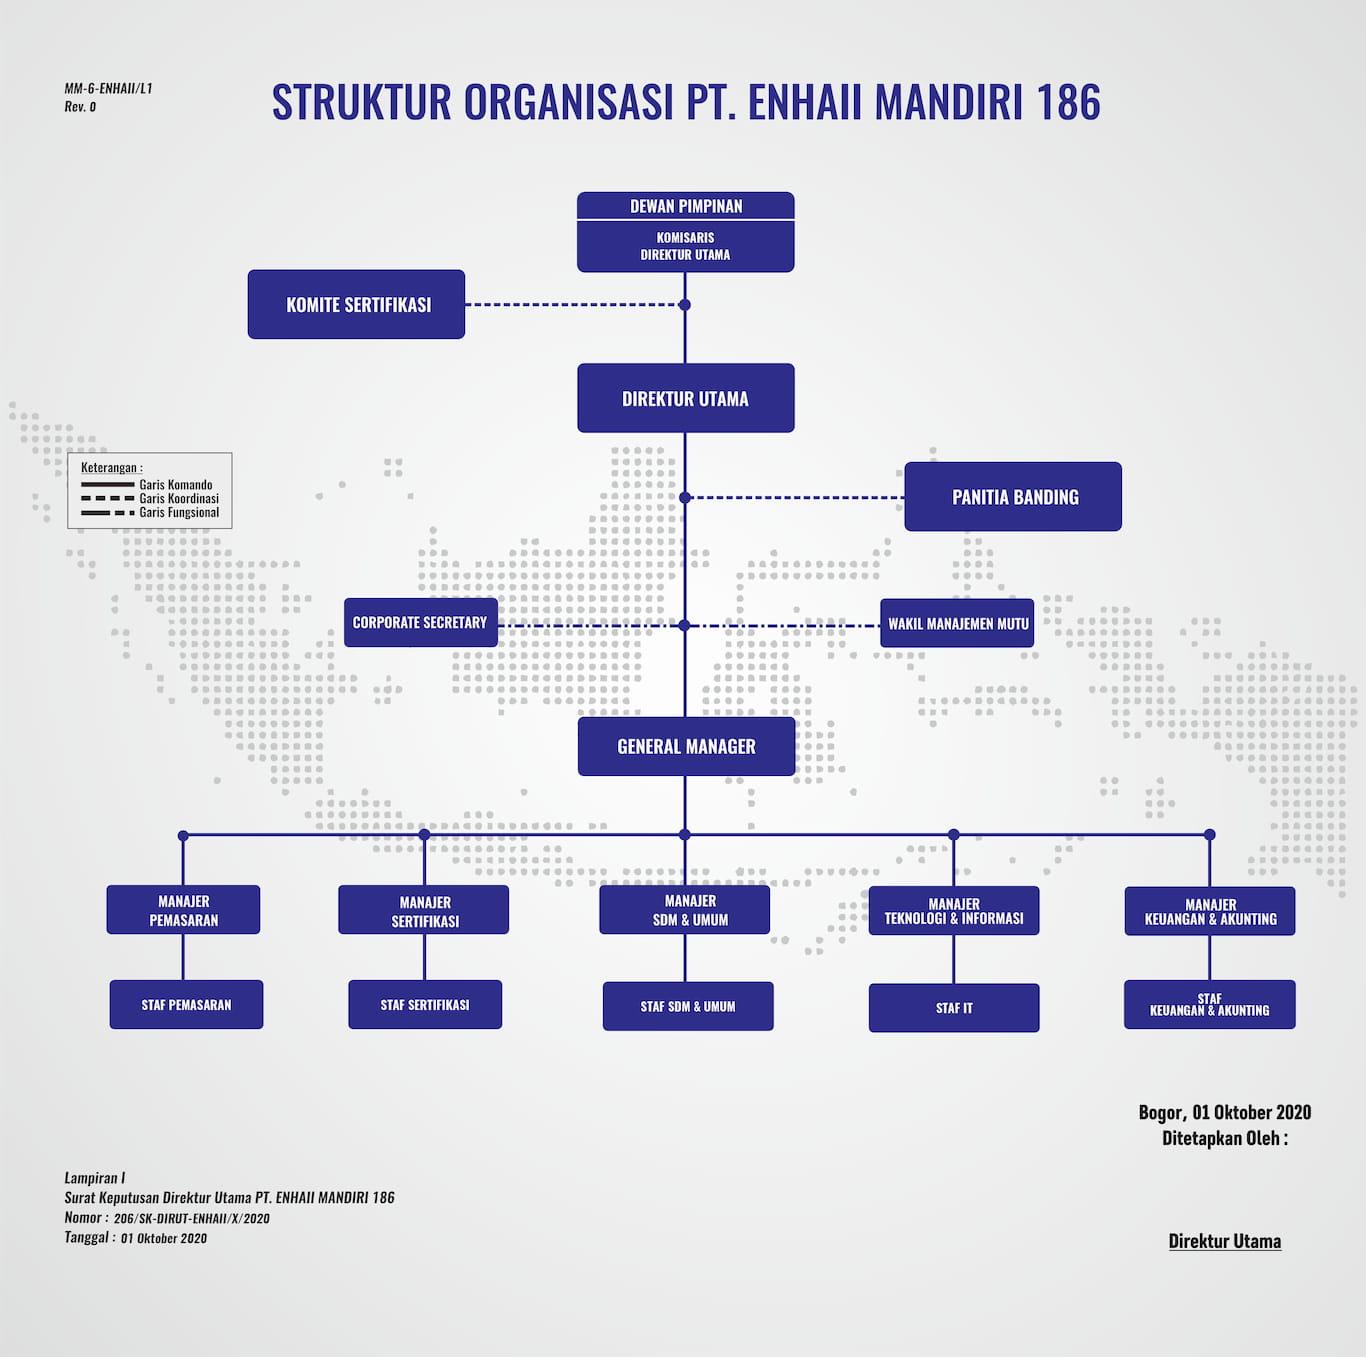 Struktur Organisasi   Enhaii